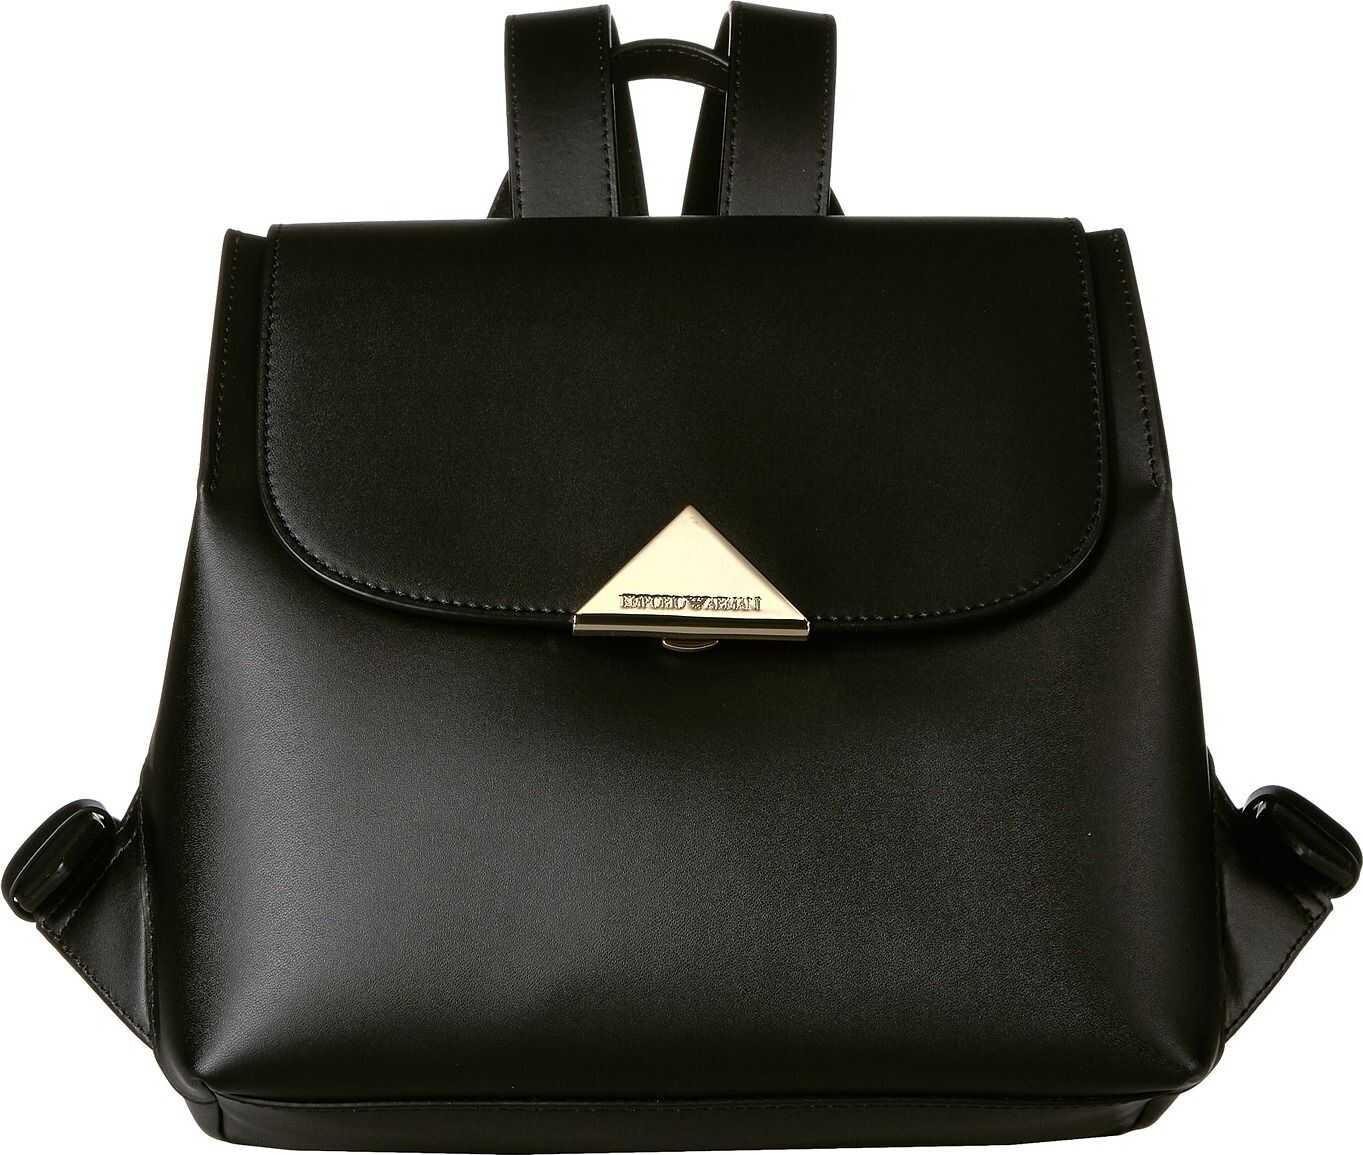 Emporio Armani Leather Backpack Black